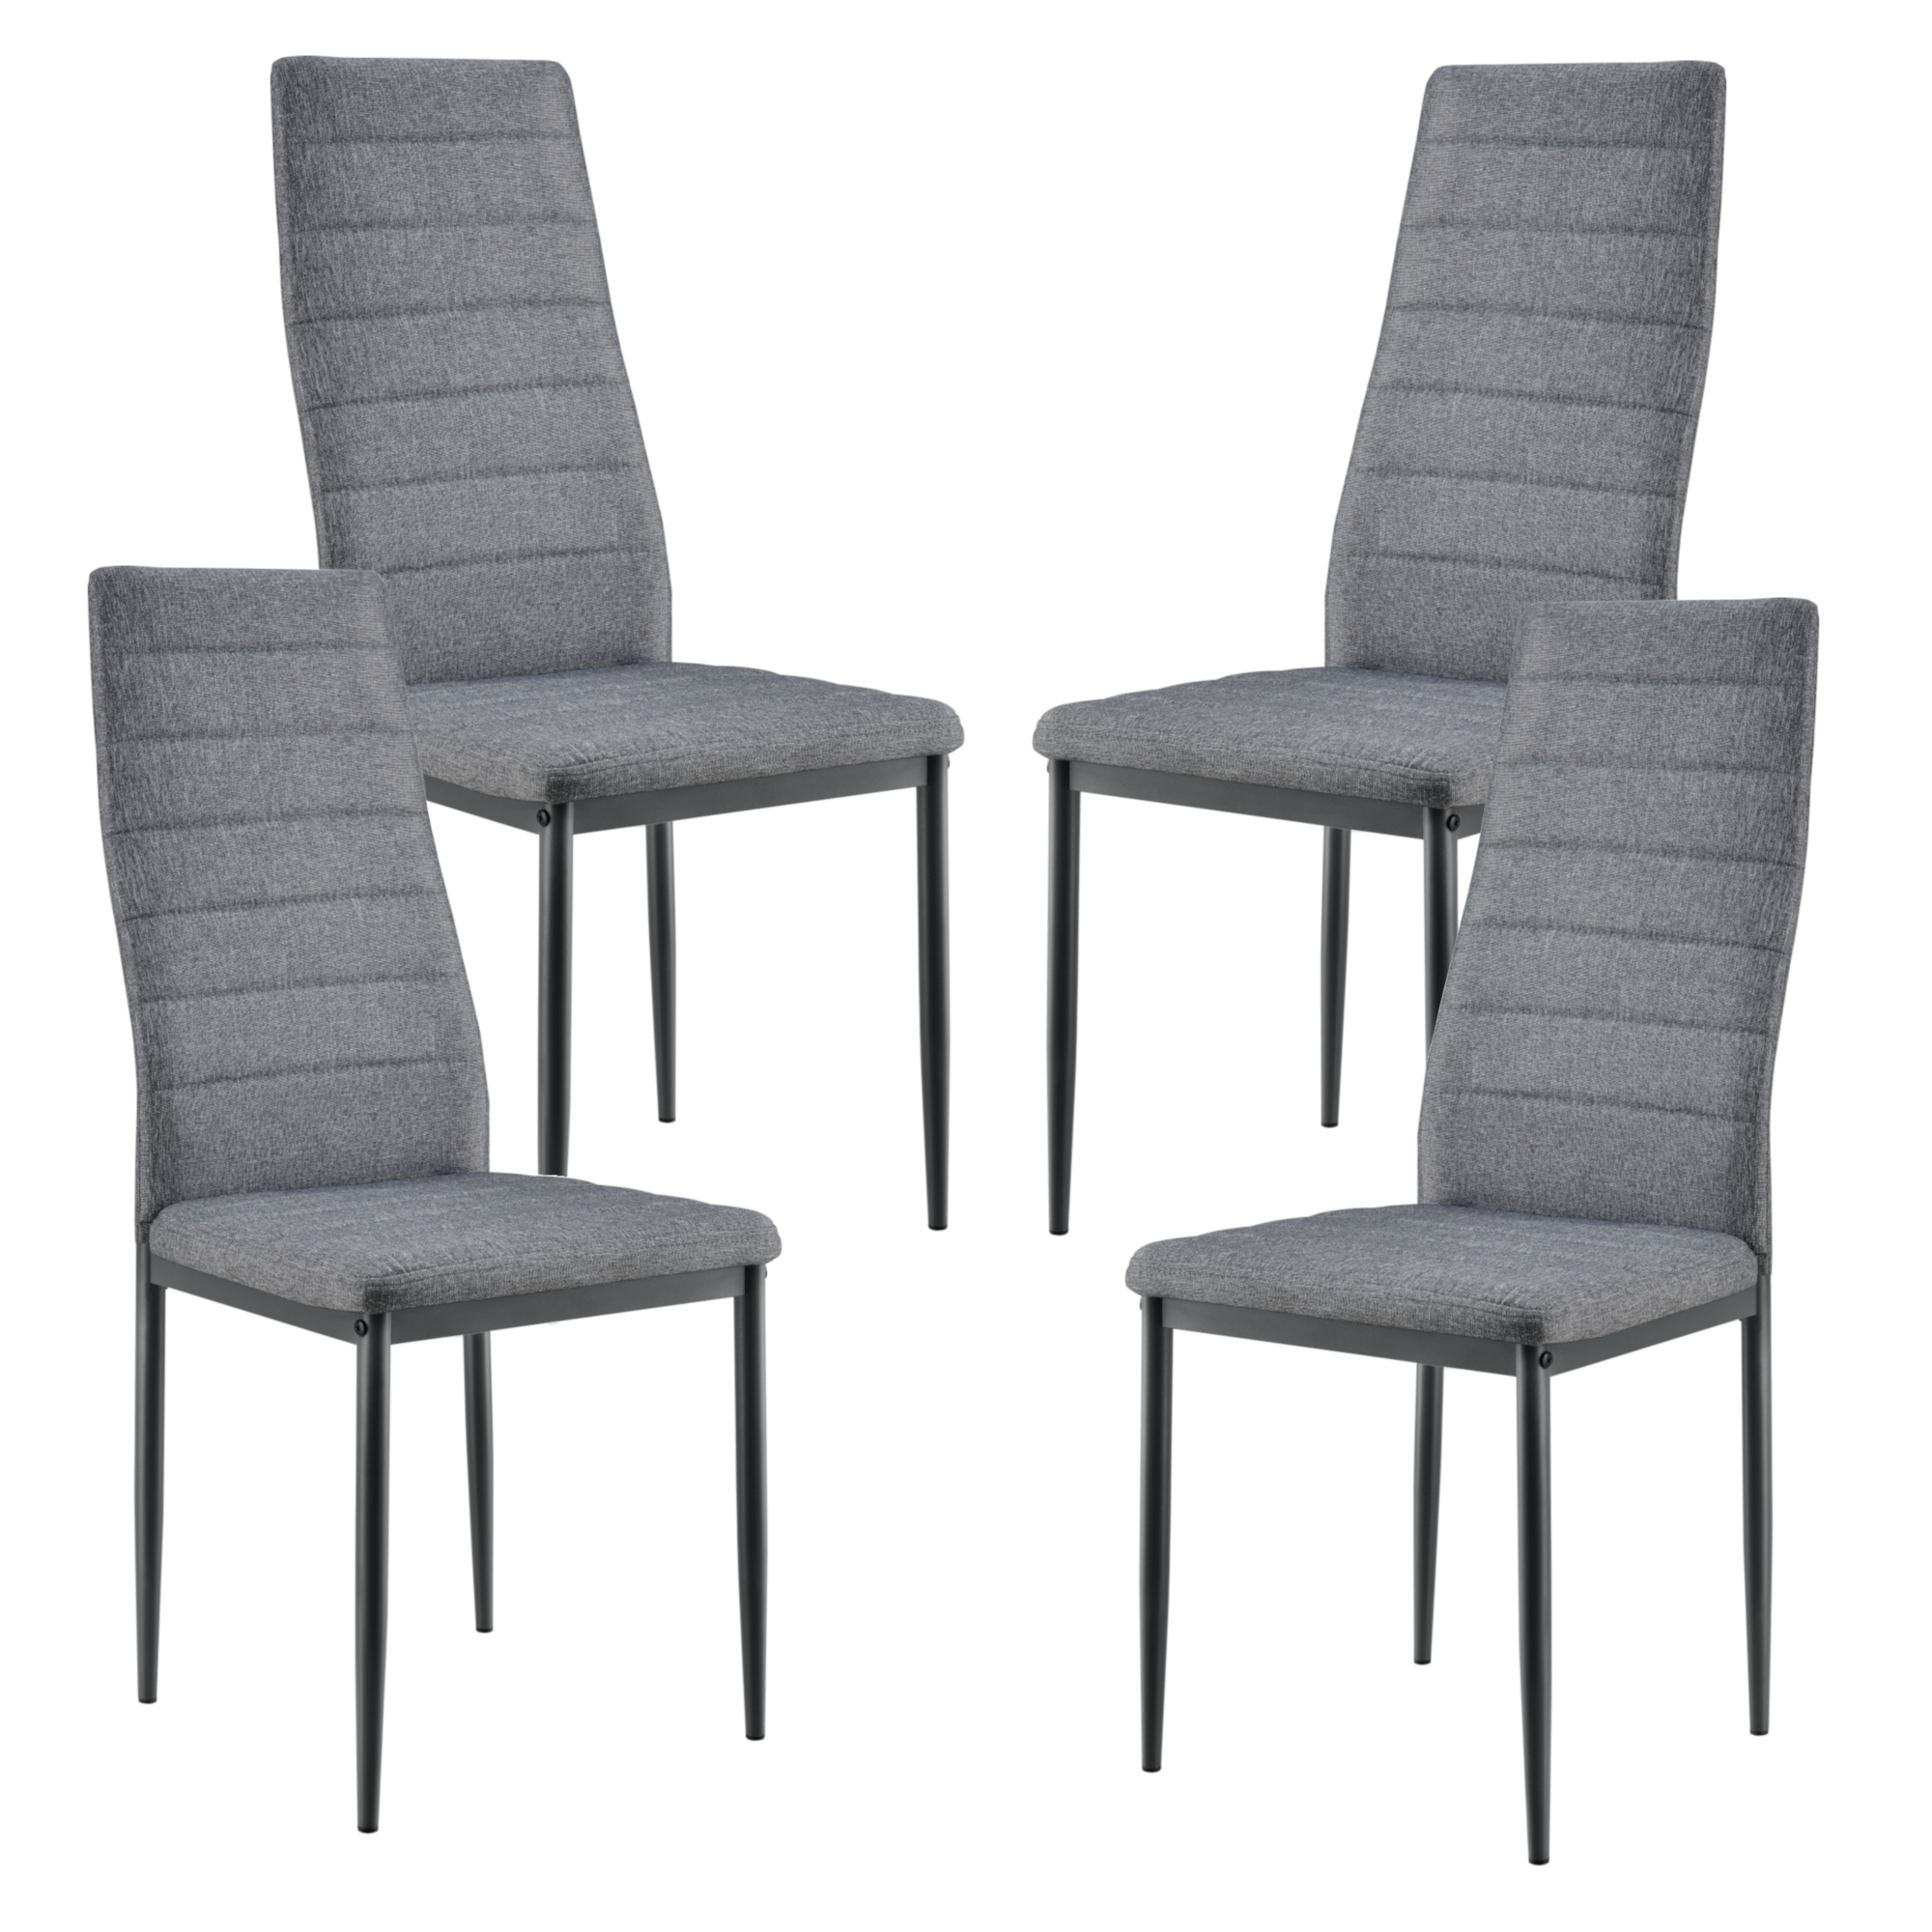 Detalles de [en.casa] Set de 4X sillas de Comedor Elegantes tapizadas de  Tela Asiento Cocina